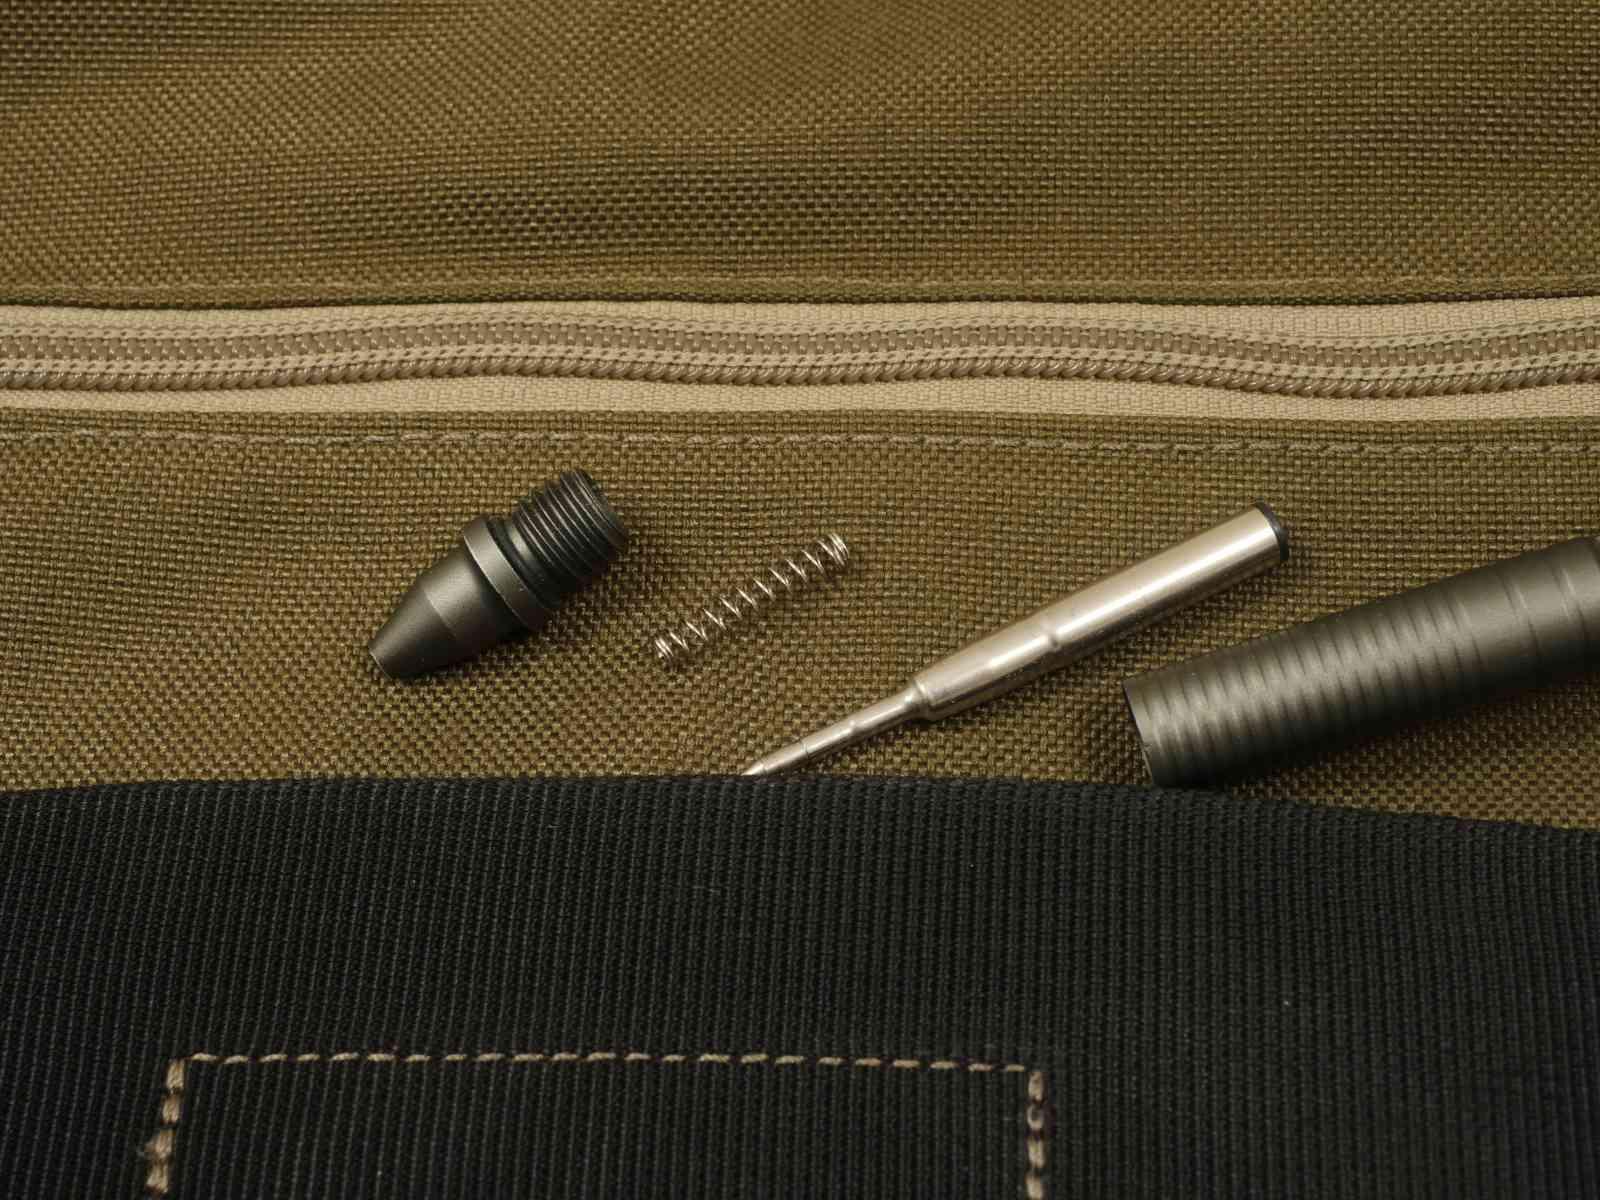 Böker Plus Tactical Pen CID cal.45 - Mine ist eine Sondergröße